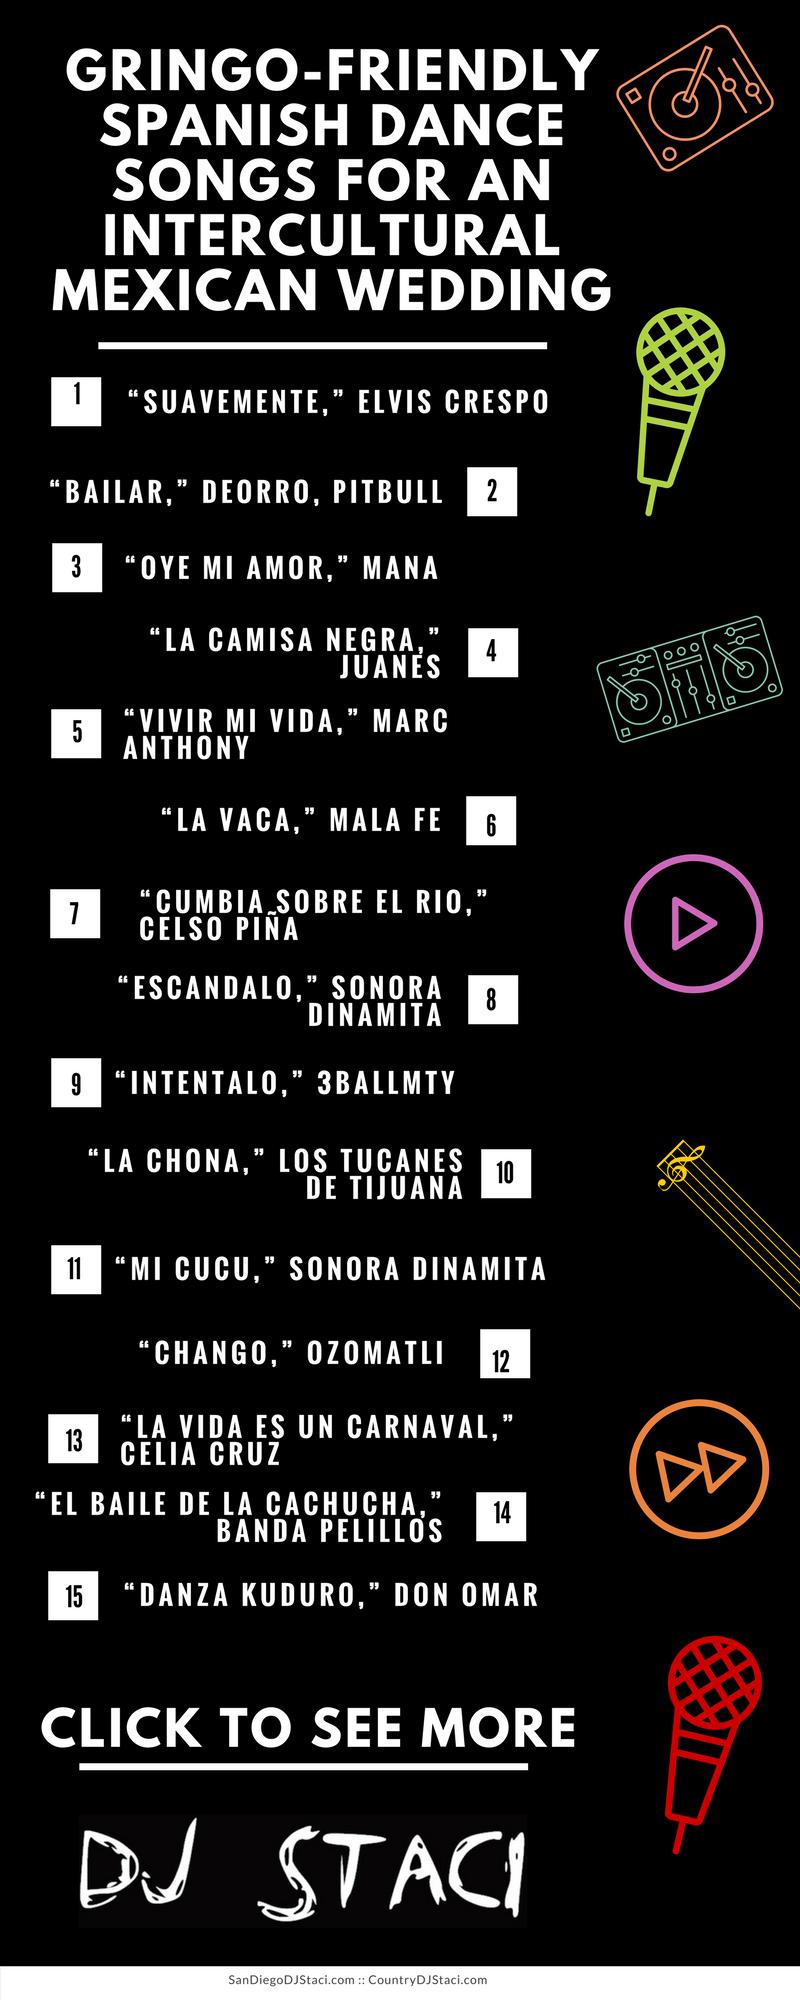 Gringo Friendly Spanish Dance Songs For Intercultural Mexican Wedding